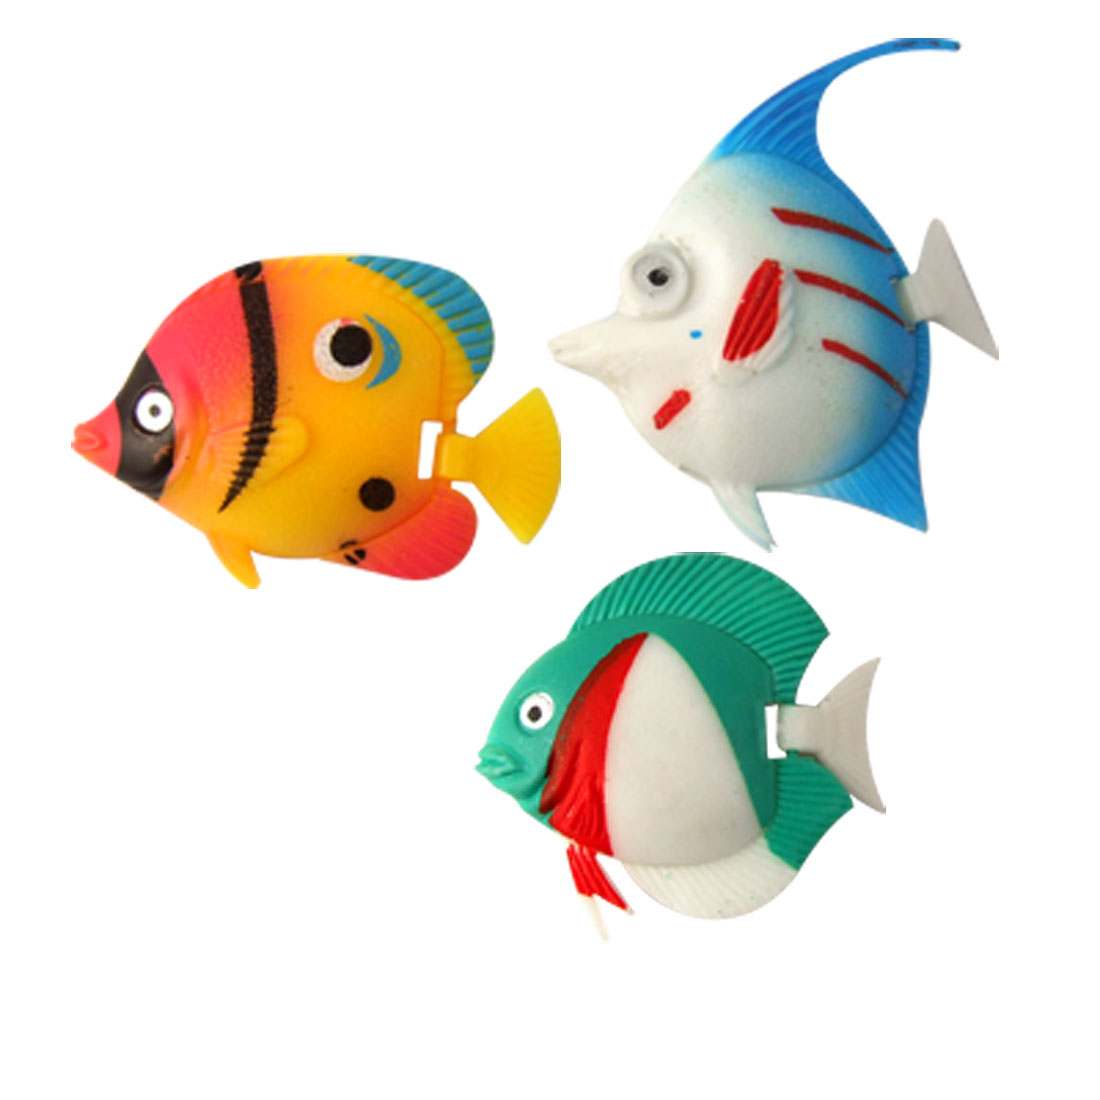 Aquarium 3 Pcs Colorful Hard Plastic Tropical Fish Decor